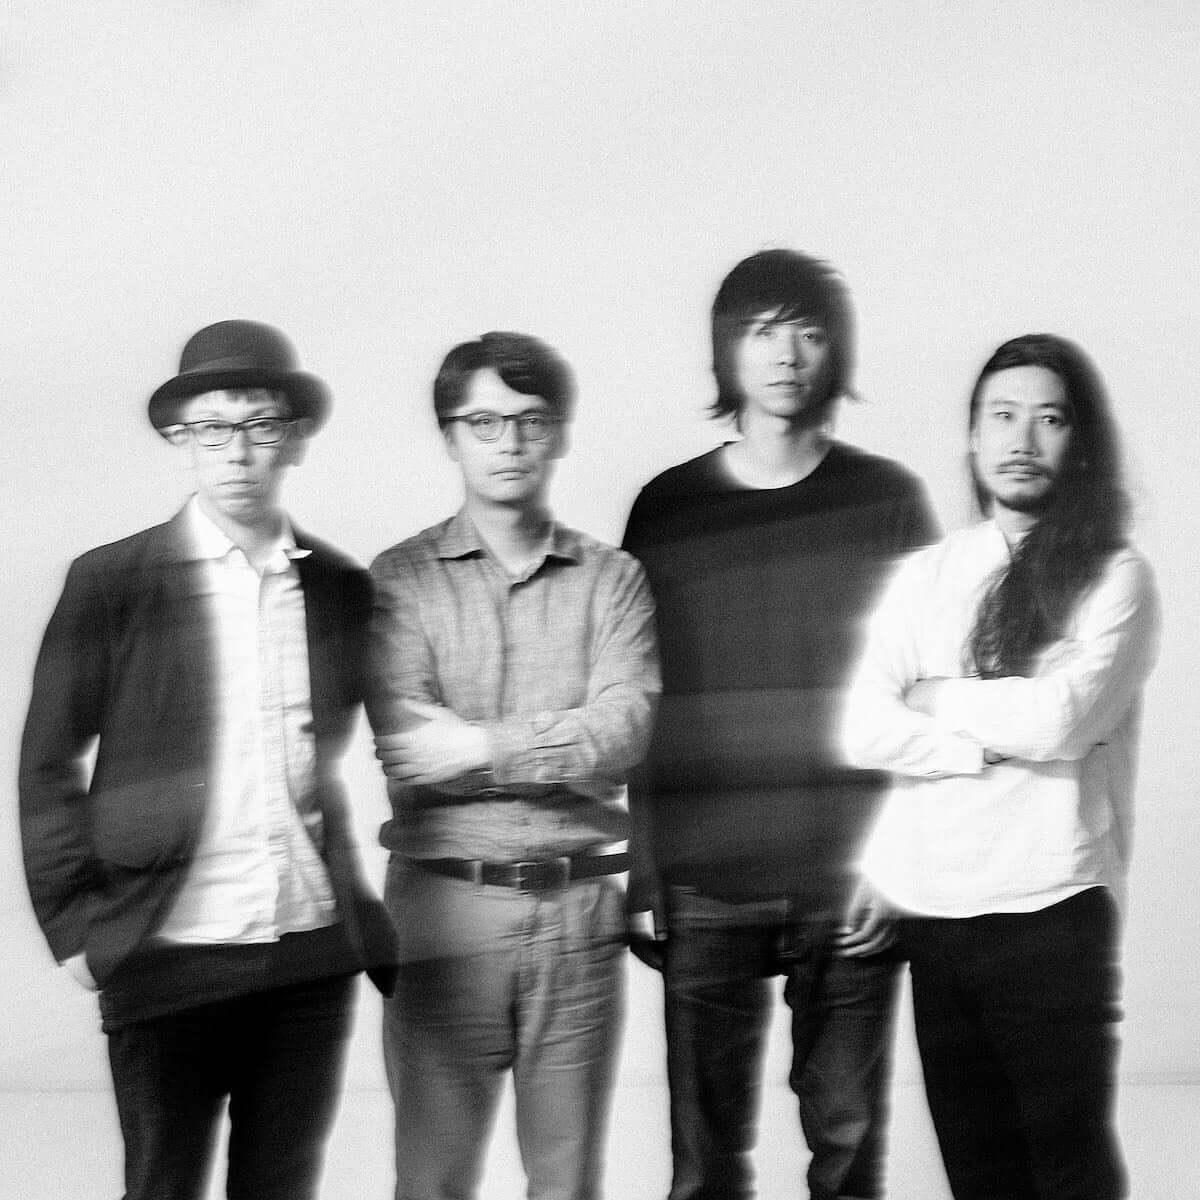 LIQUIDROOMカウントダウンにOGRE YOU ASSHOLEと小袋成彬(DJ)、John Natsukiの出演が発表! music181214-liquidroom-presents-new-year-party-2019-3-1-1200x1200